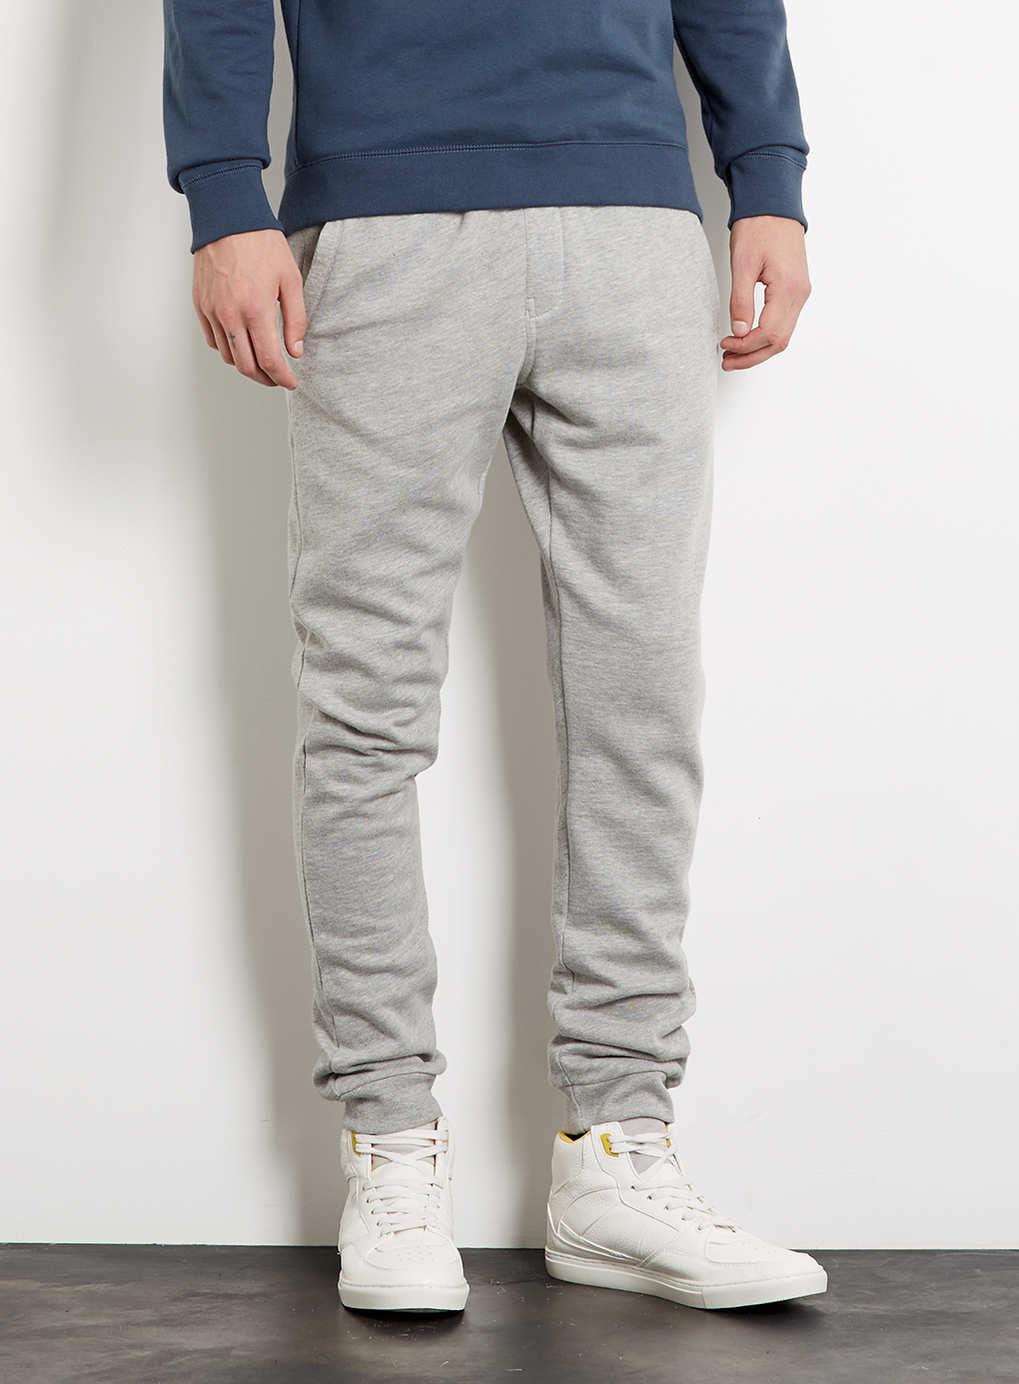 Grey Marl Skinny Sweatpants, $40